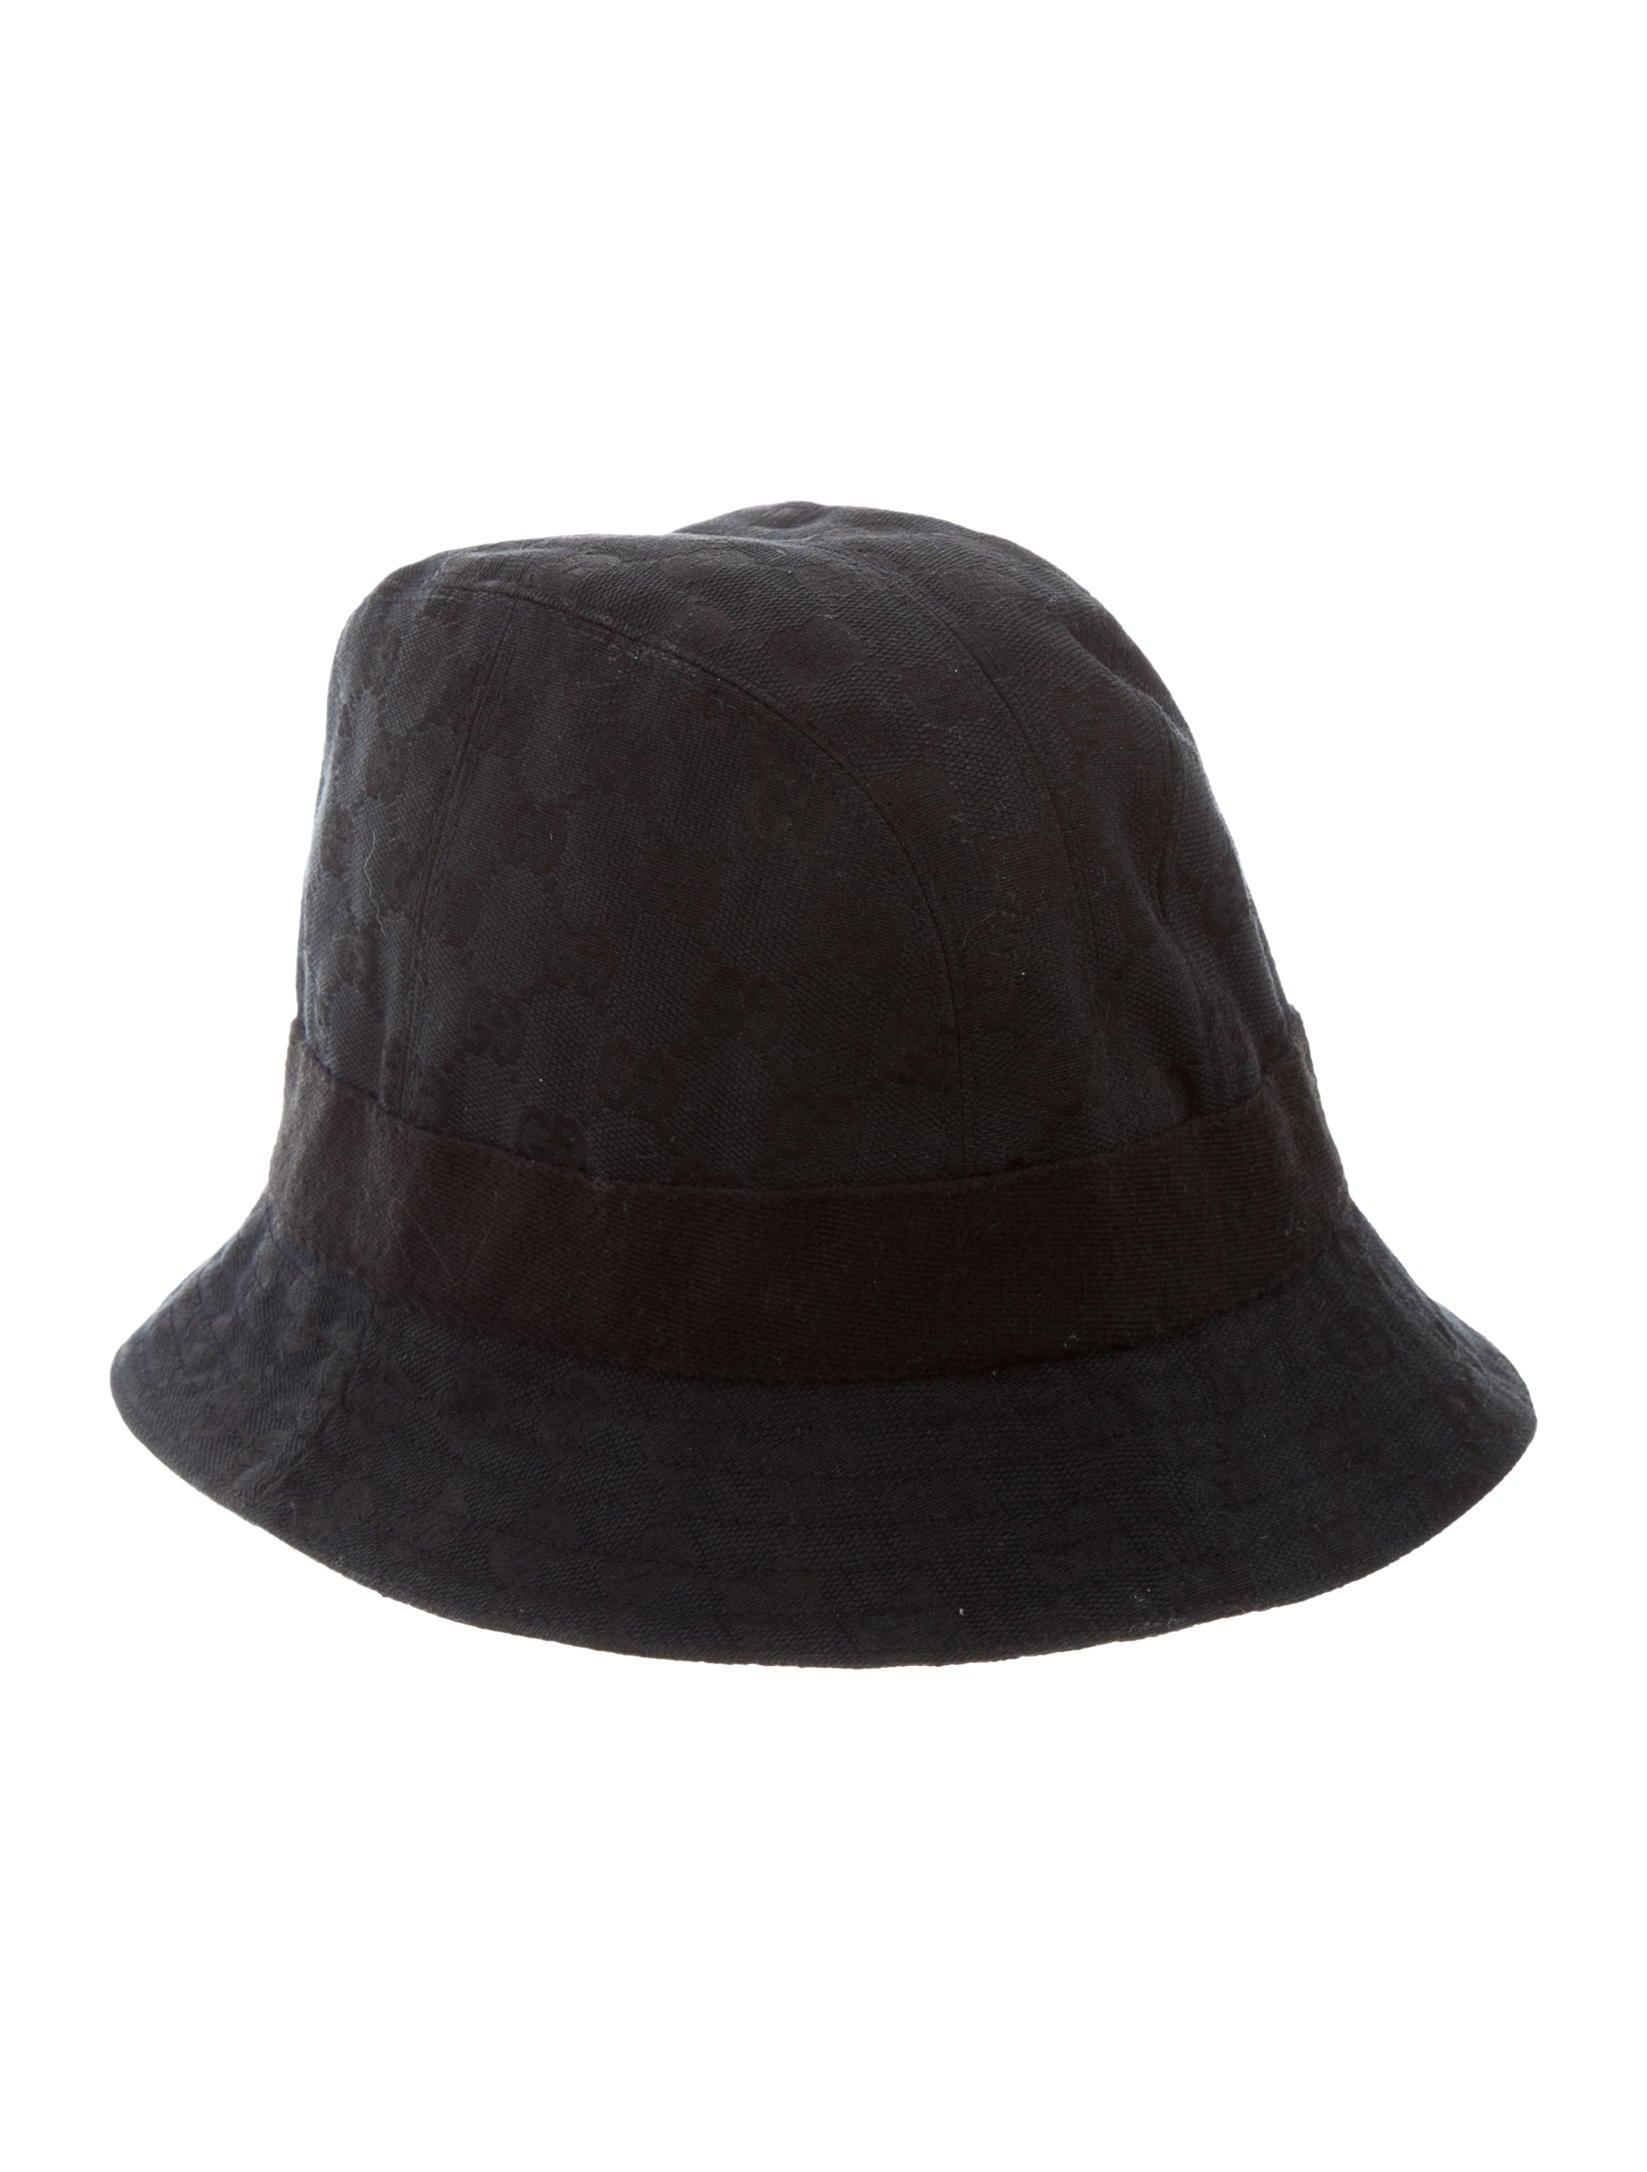 Gucci GG Canvas Bucket Hat - Accessories - GUC156443  d90943db31a